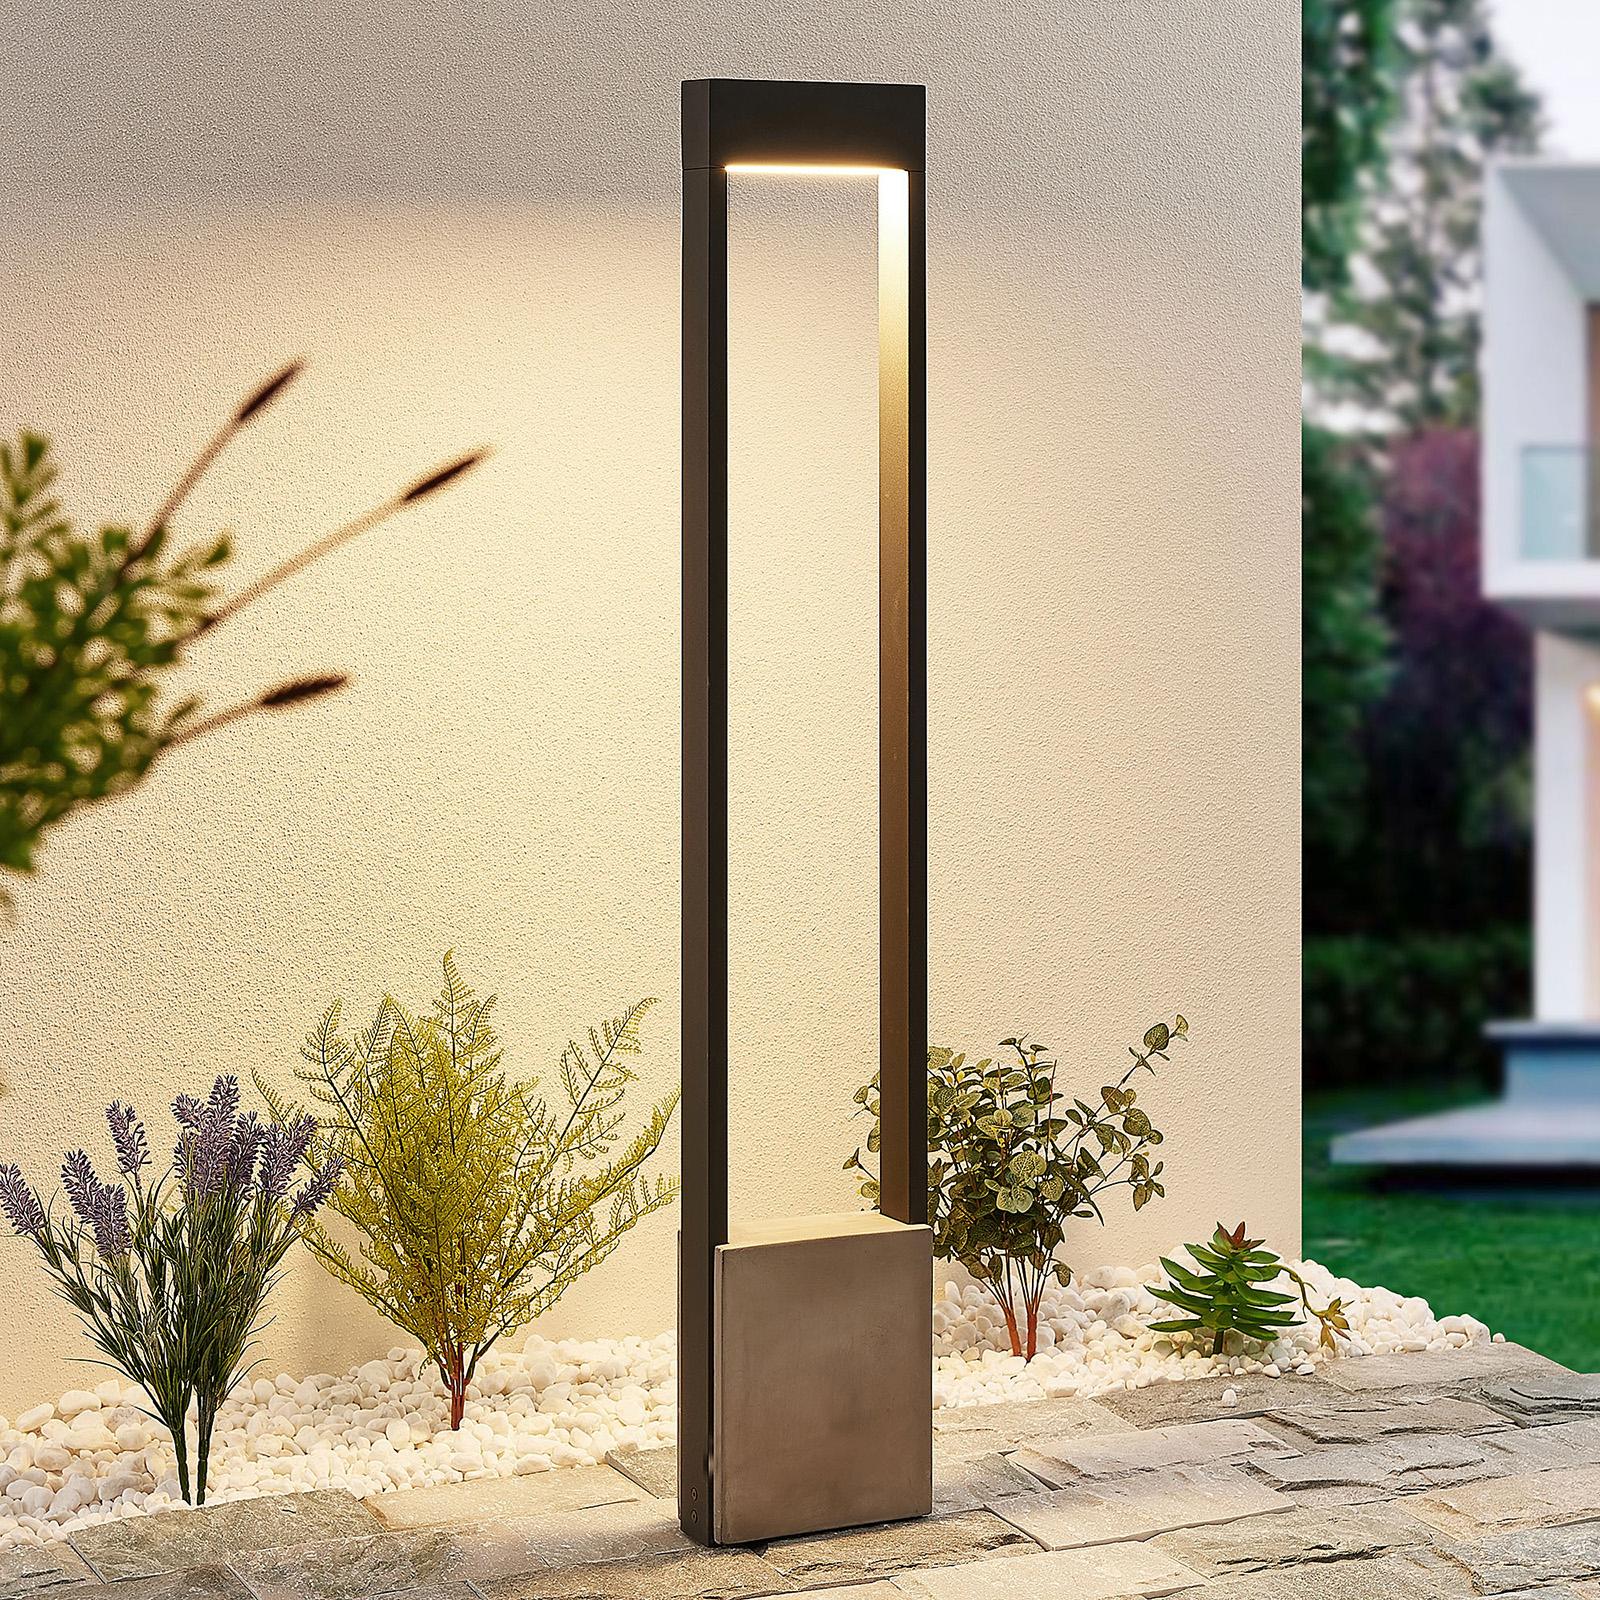 Lucande Tekiro LED-gånglampa, betong, 100 cm